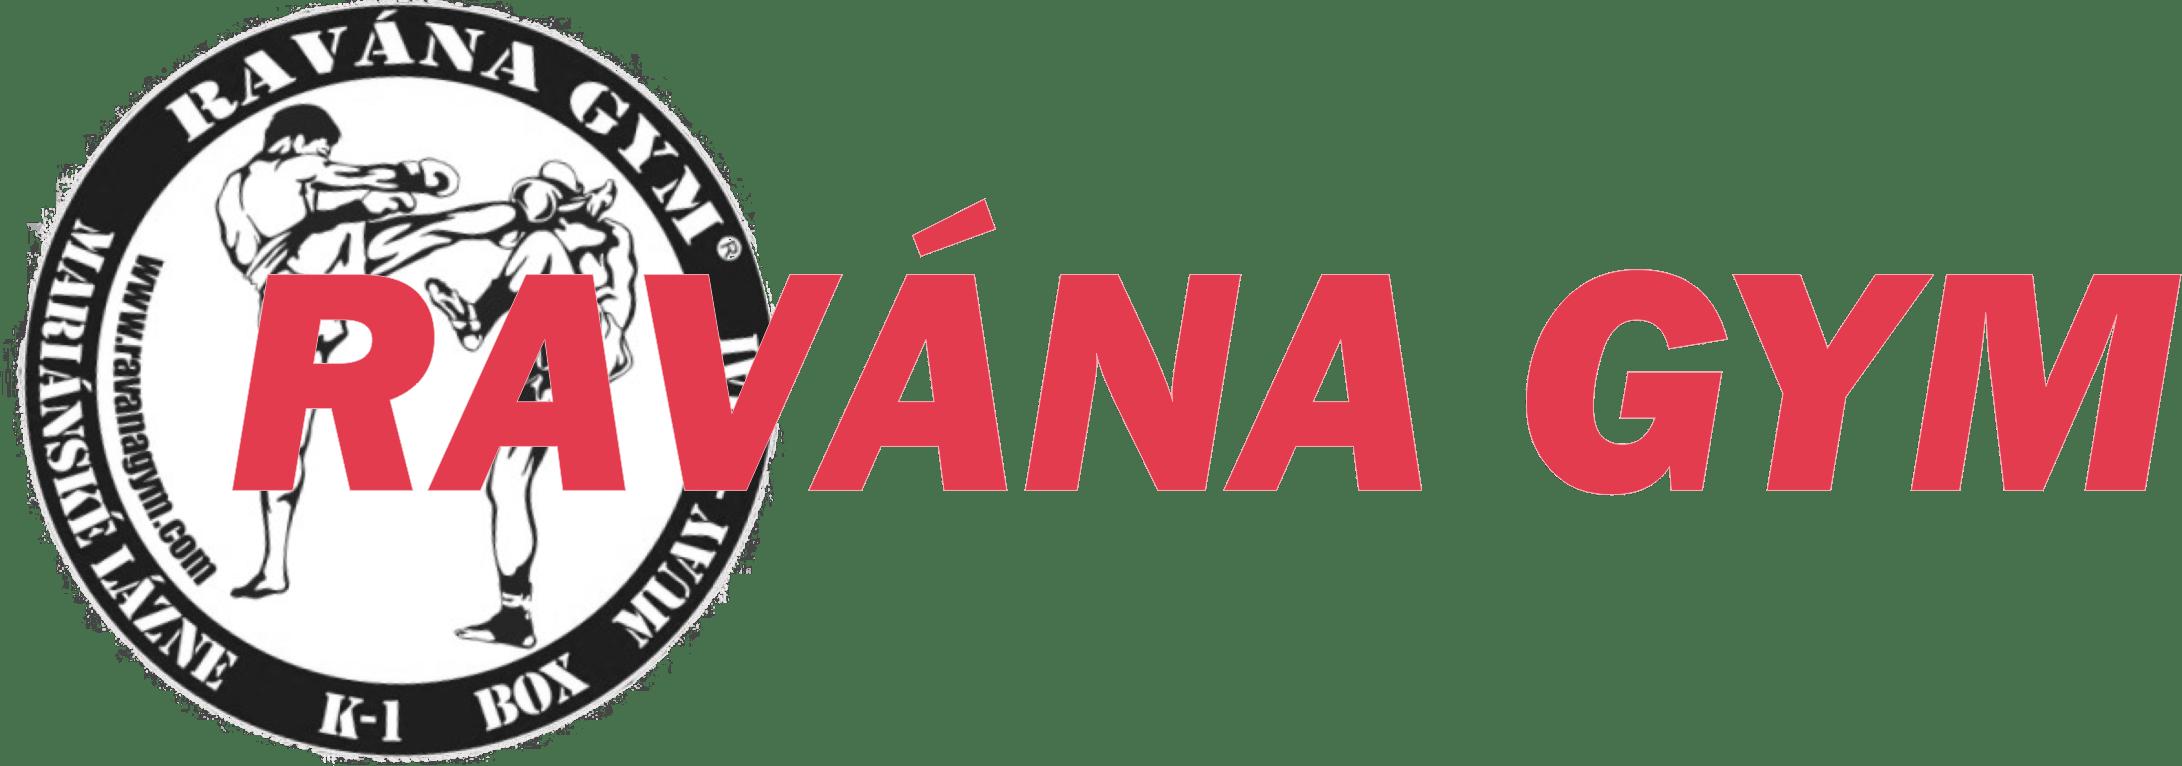 //muaythai.ravanagym.com/wp-content/uploads/2020/09/logo3.png